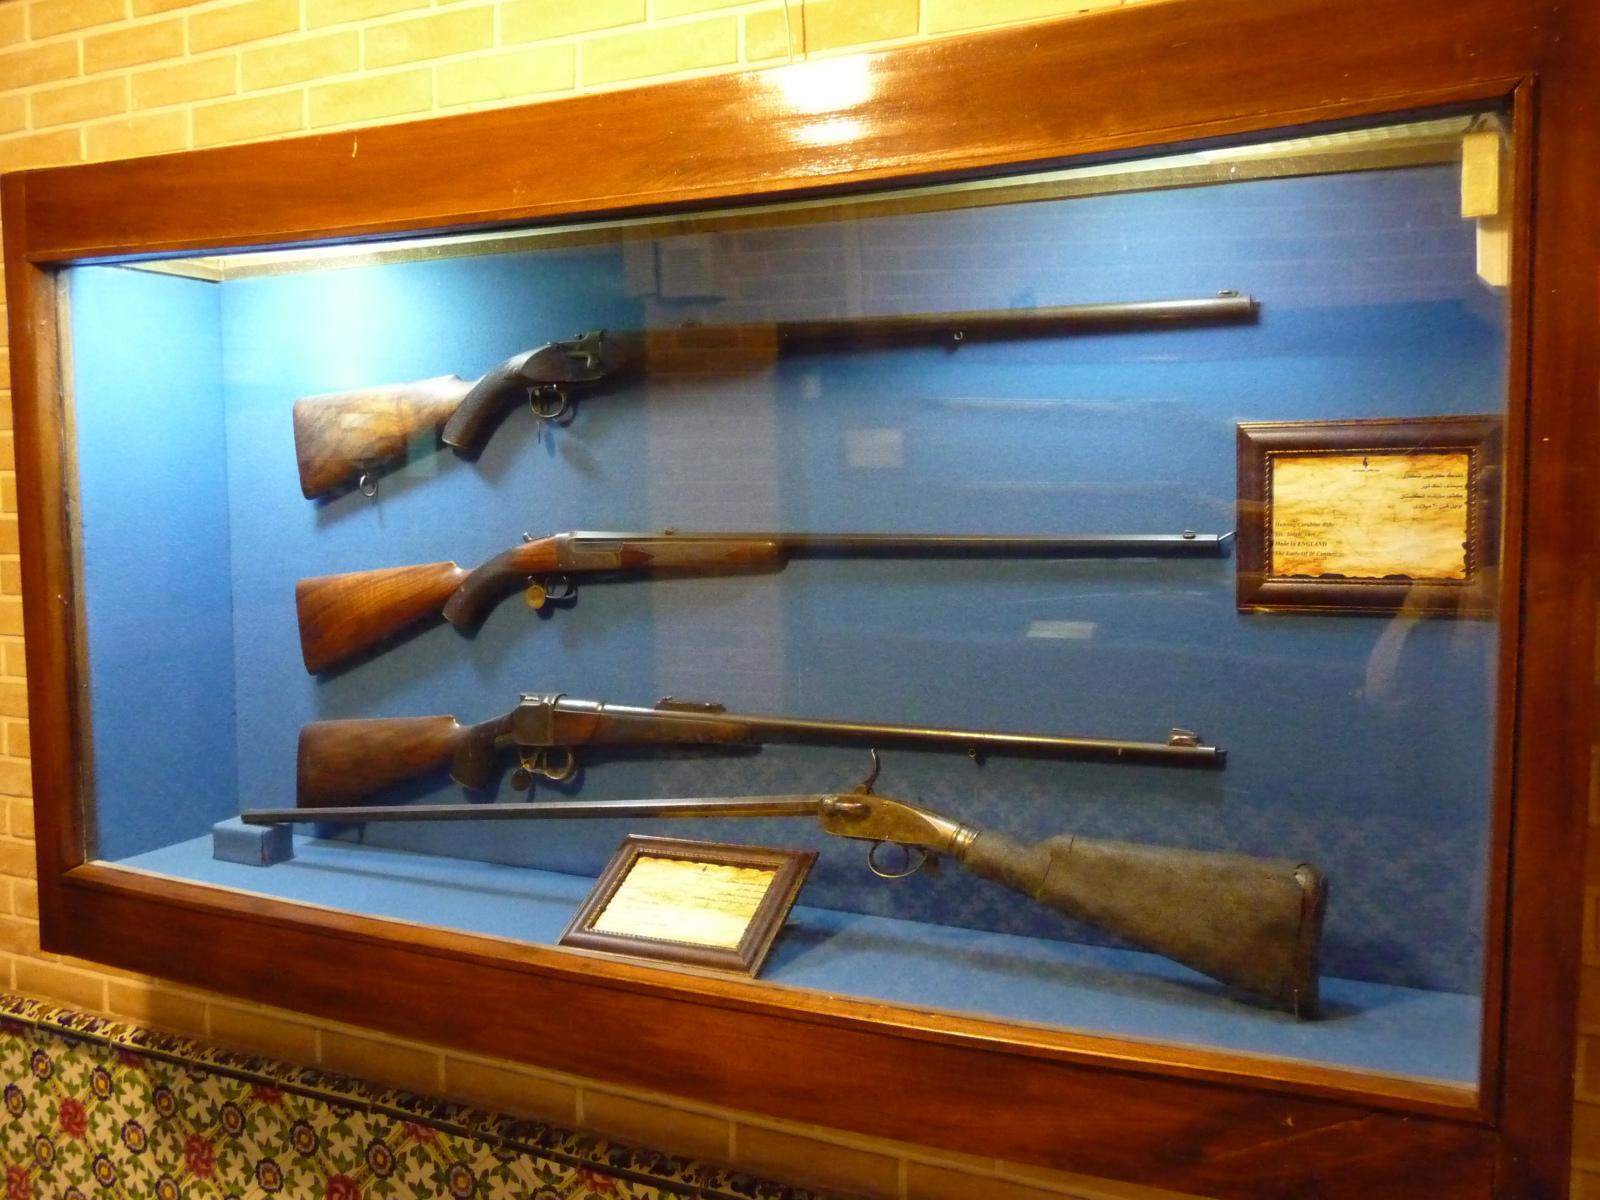 Baq-e Afifabad - Museum - Carabine Rifles 20C France